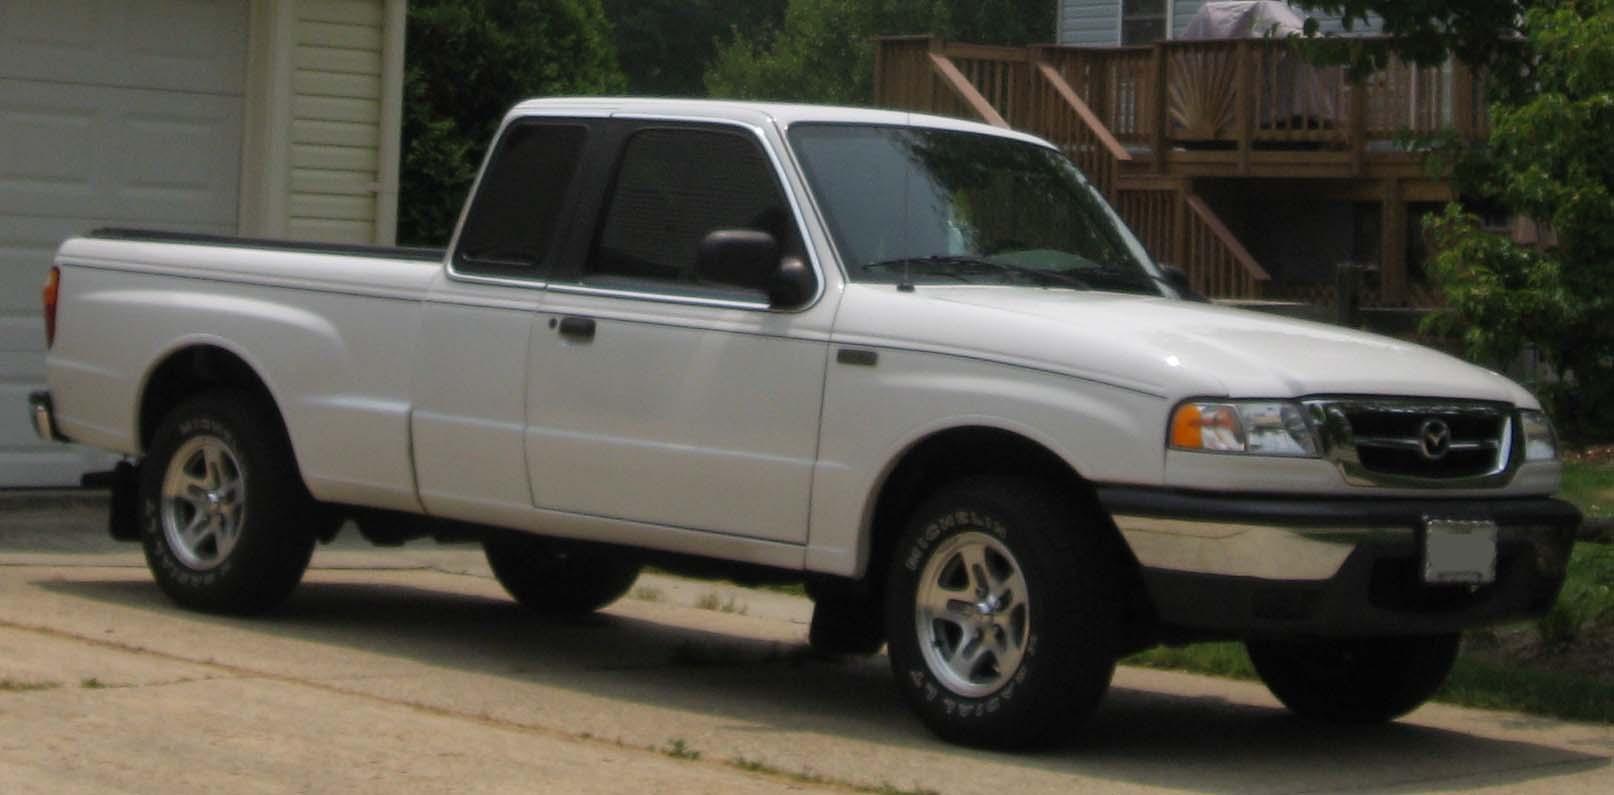 File:Mazda-B-Series.jpg - Wikimedia Commons